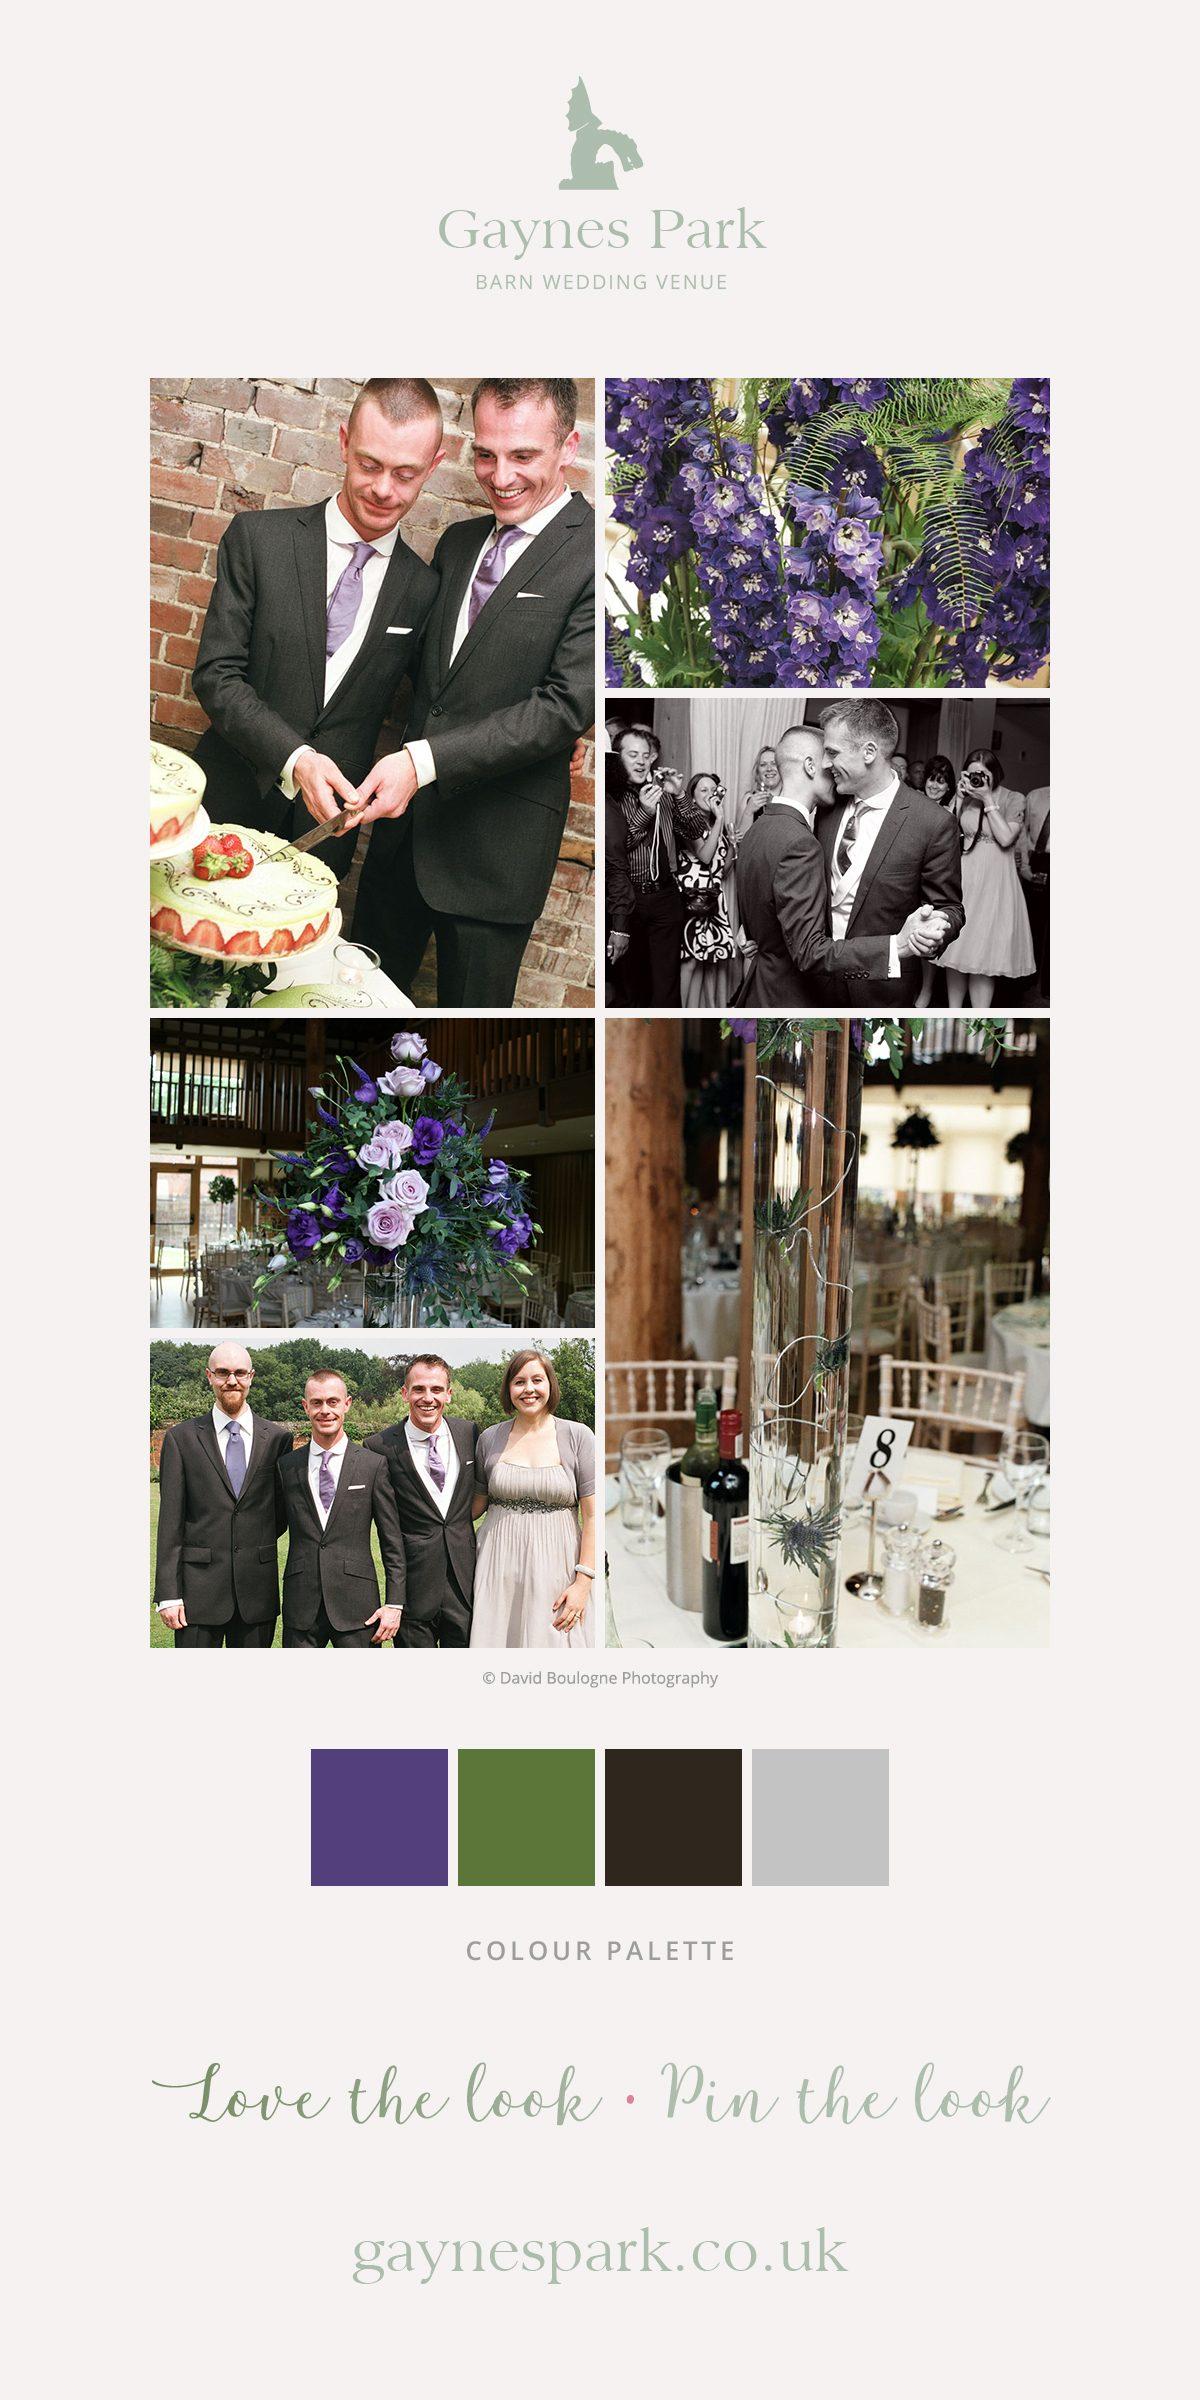 Paul amnd Bryan's real life wedding at Gaynes Park